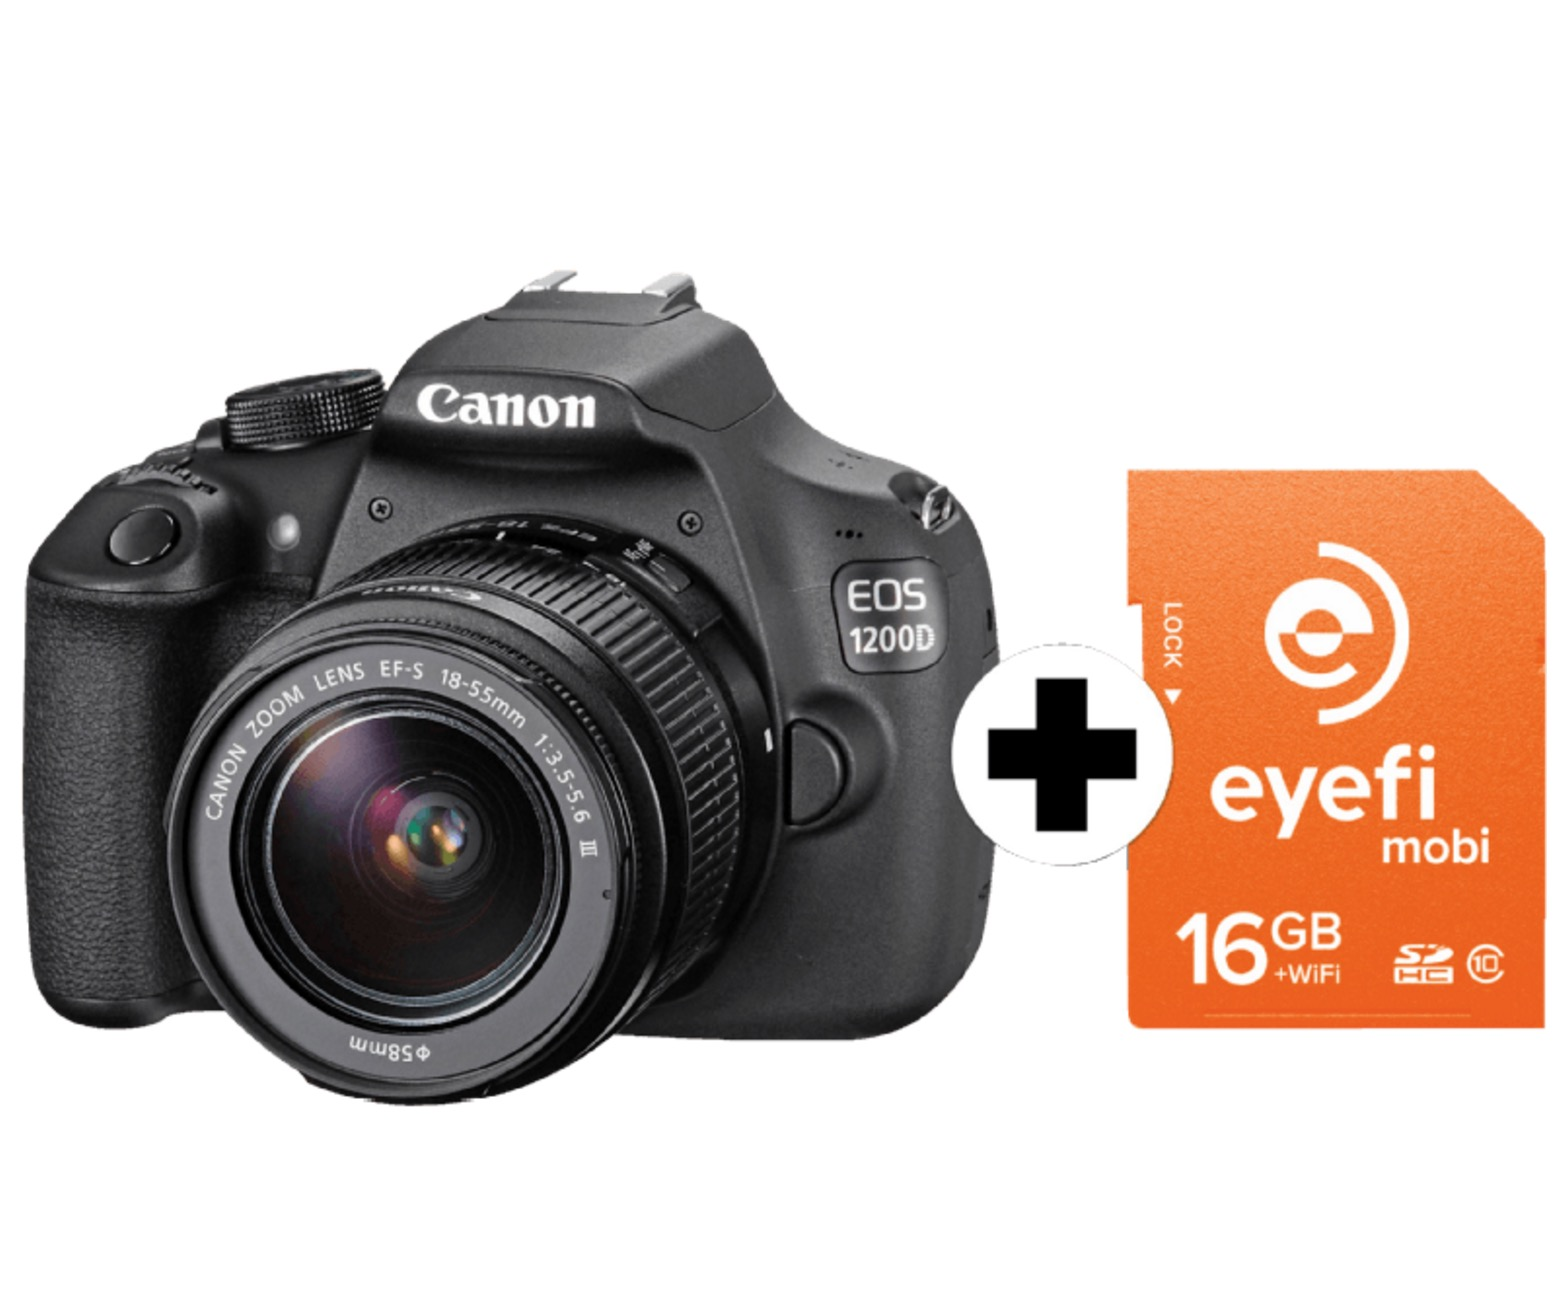 CANON EOS 1200D (18 MP, 18-55 mm Objektiv) + Eyefi Speicherkarte nur 299,- Euro